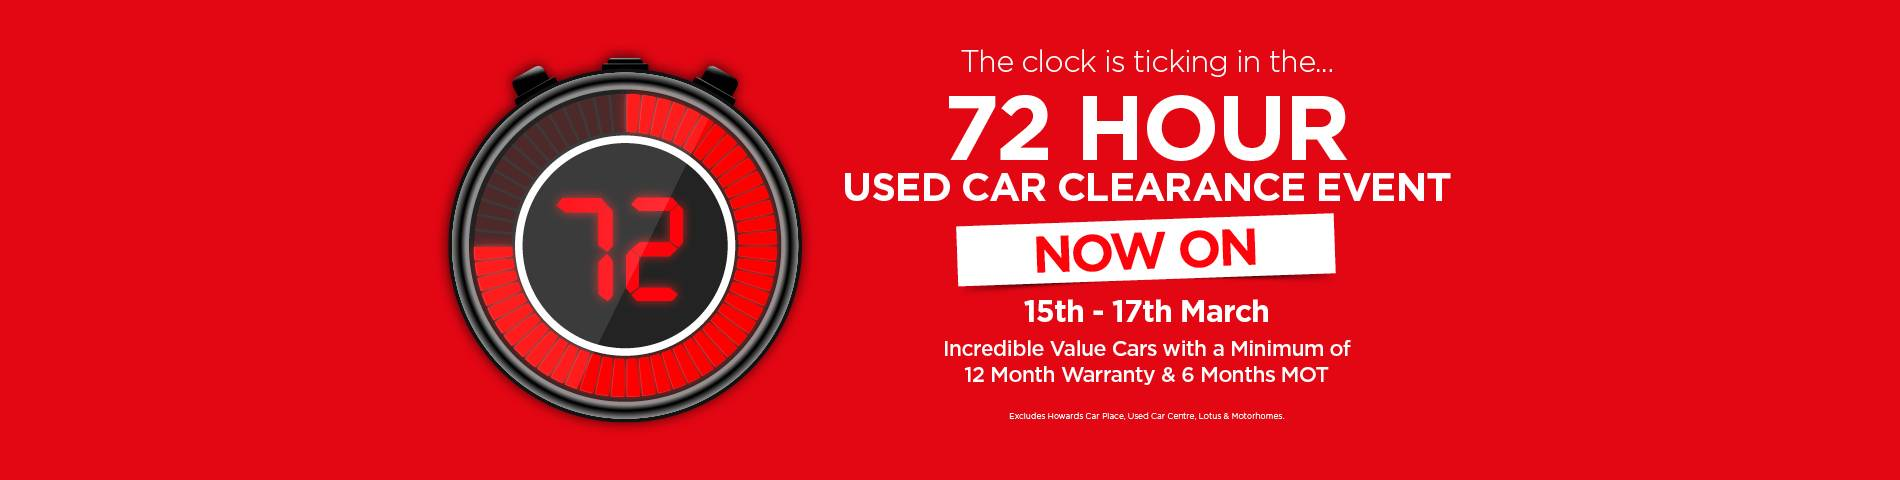 72 Hour Clearance